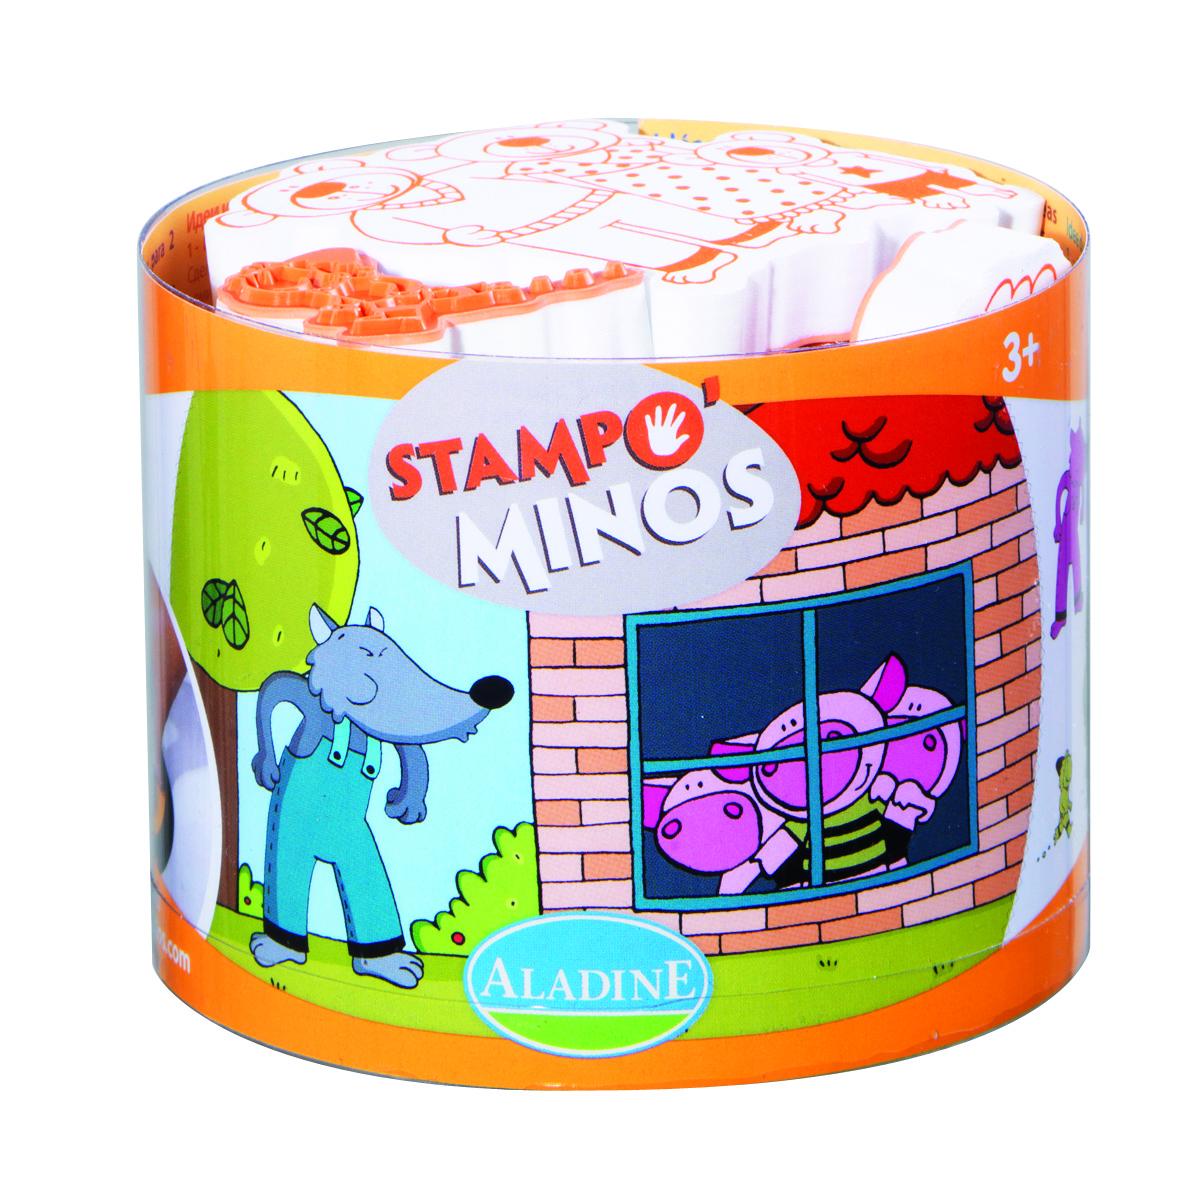 Razítka pro děti, z pohádky do pohádky, StampoMinos